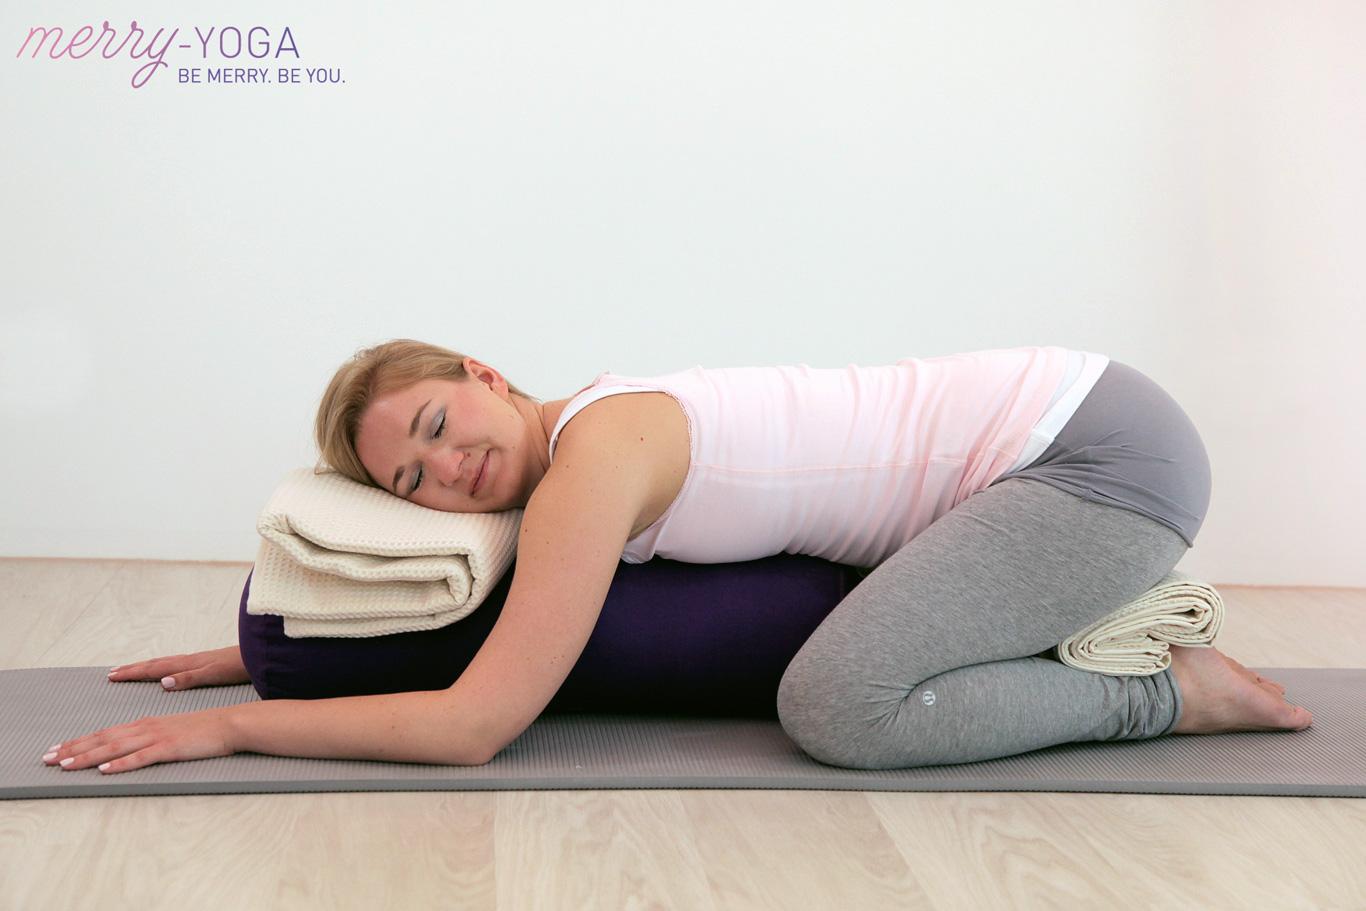 Merry-Yoga | München | Kindshaltung